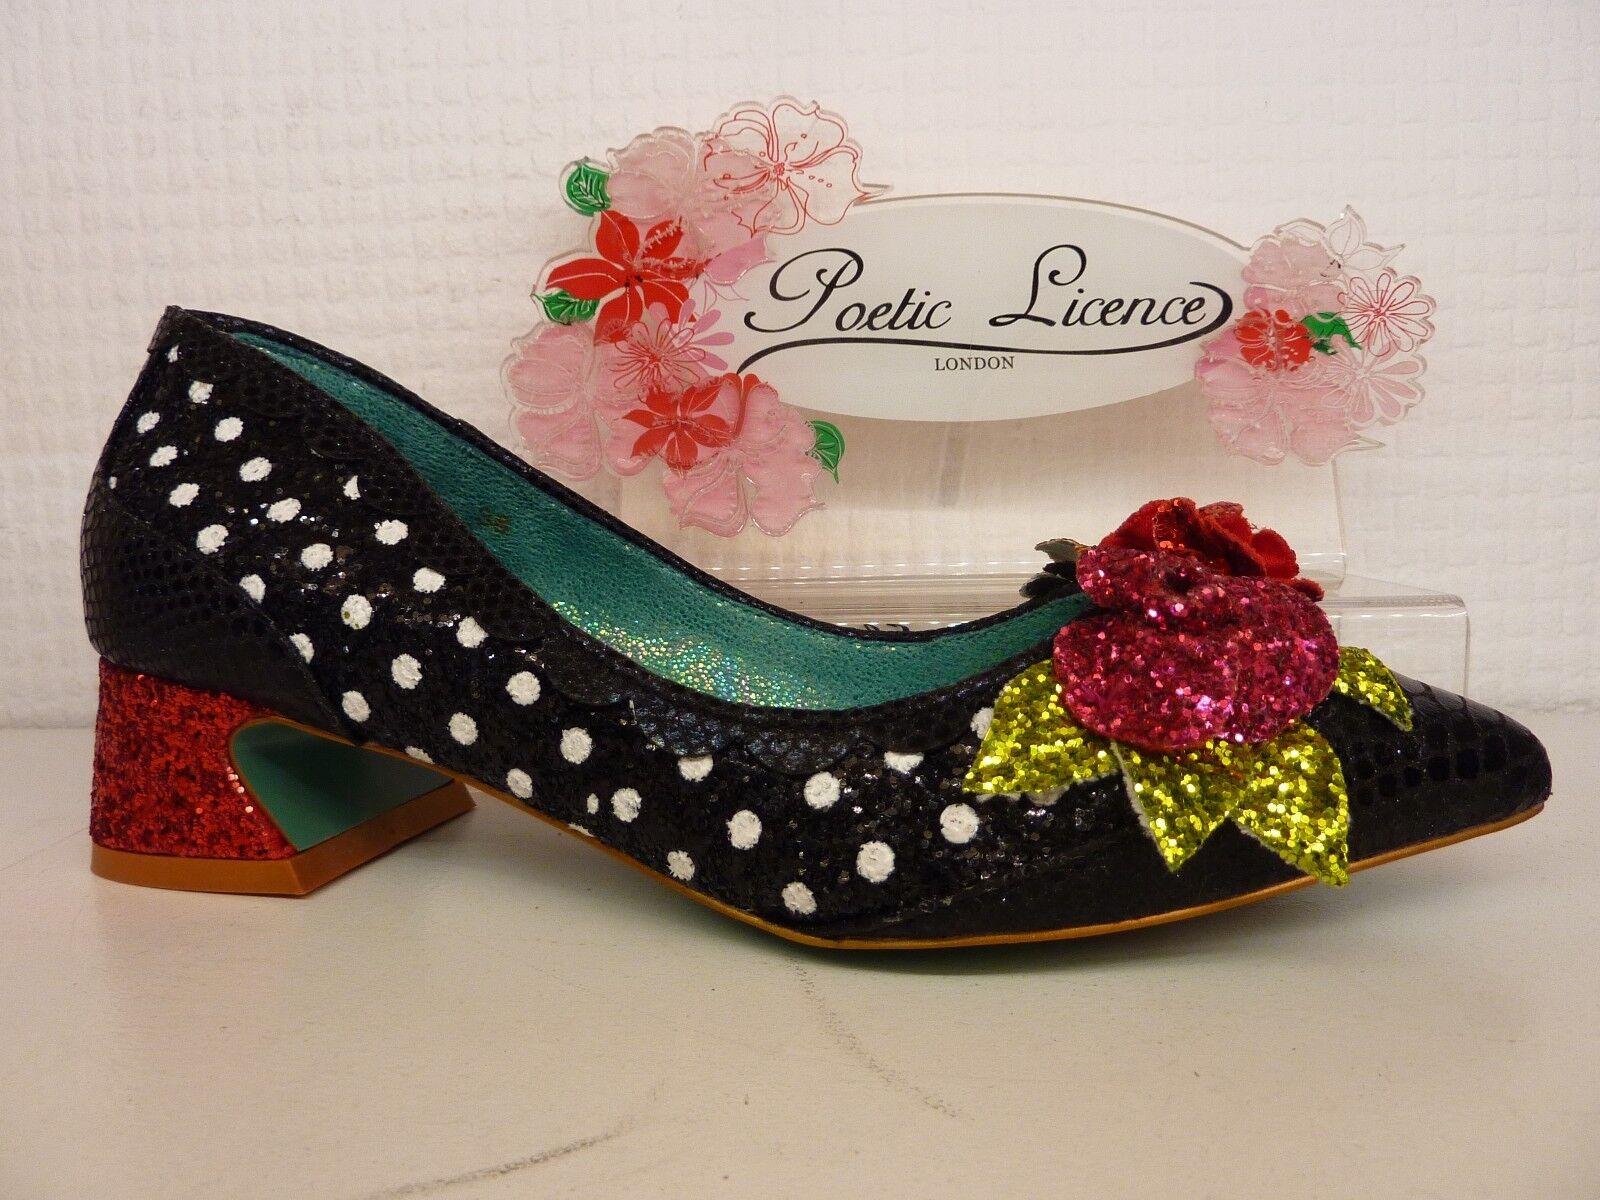 designer online Poetic Licence da Irregular Irregular Irregular Choice Sway Nero a Pois Glitter Scarpa Donna  la migliore offerta del negozio online